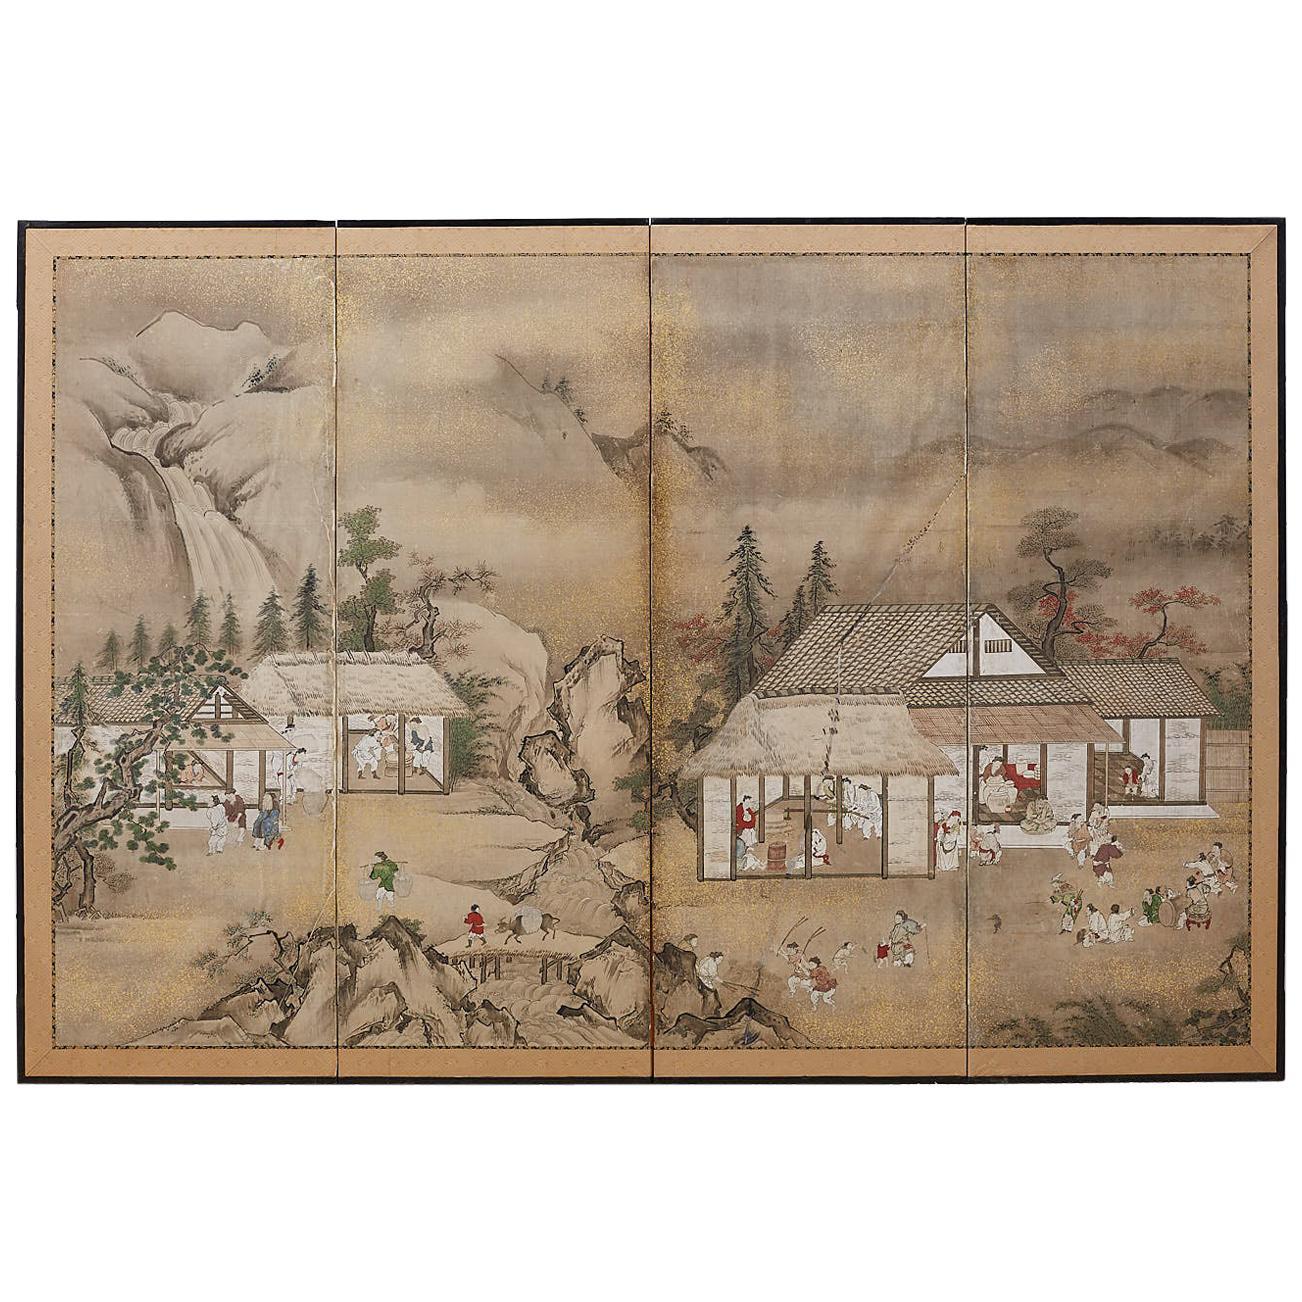 Japanese Edo Four-Panel Screen of Village Life